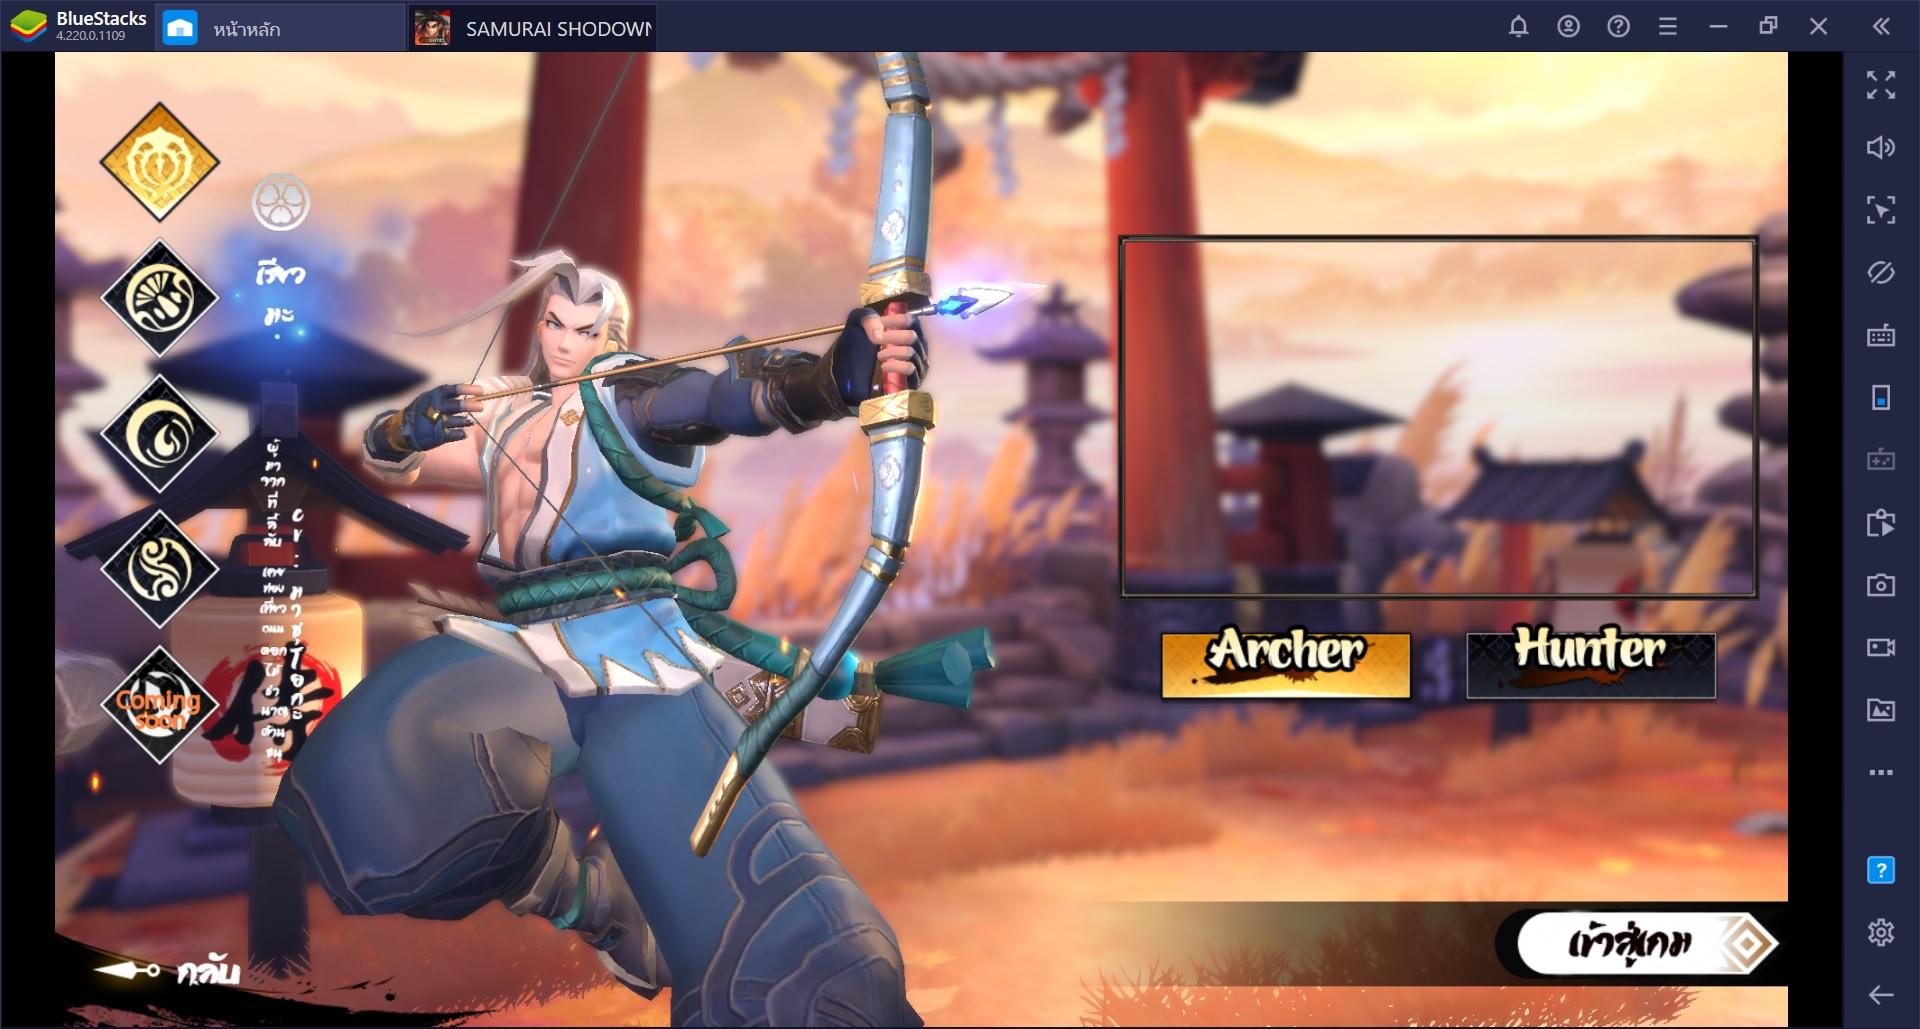 Samurai Shodown แนะนำอาชีพภายในเกมรู้ไว้จะได้ไม่พลาด